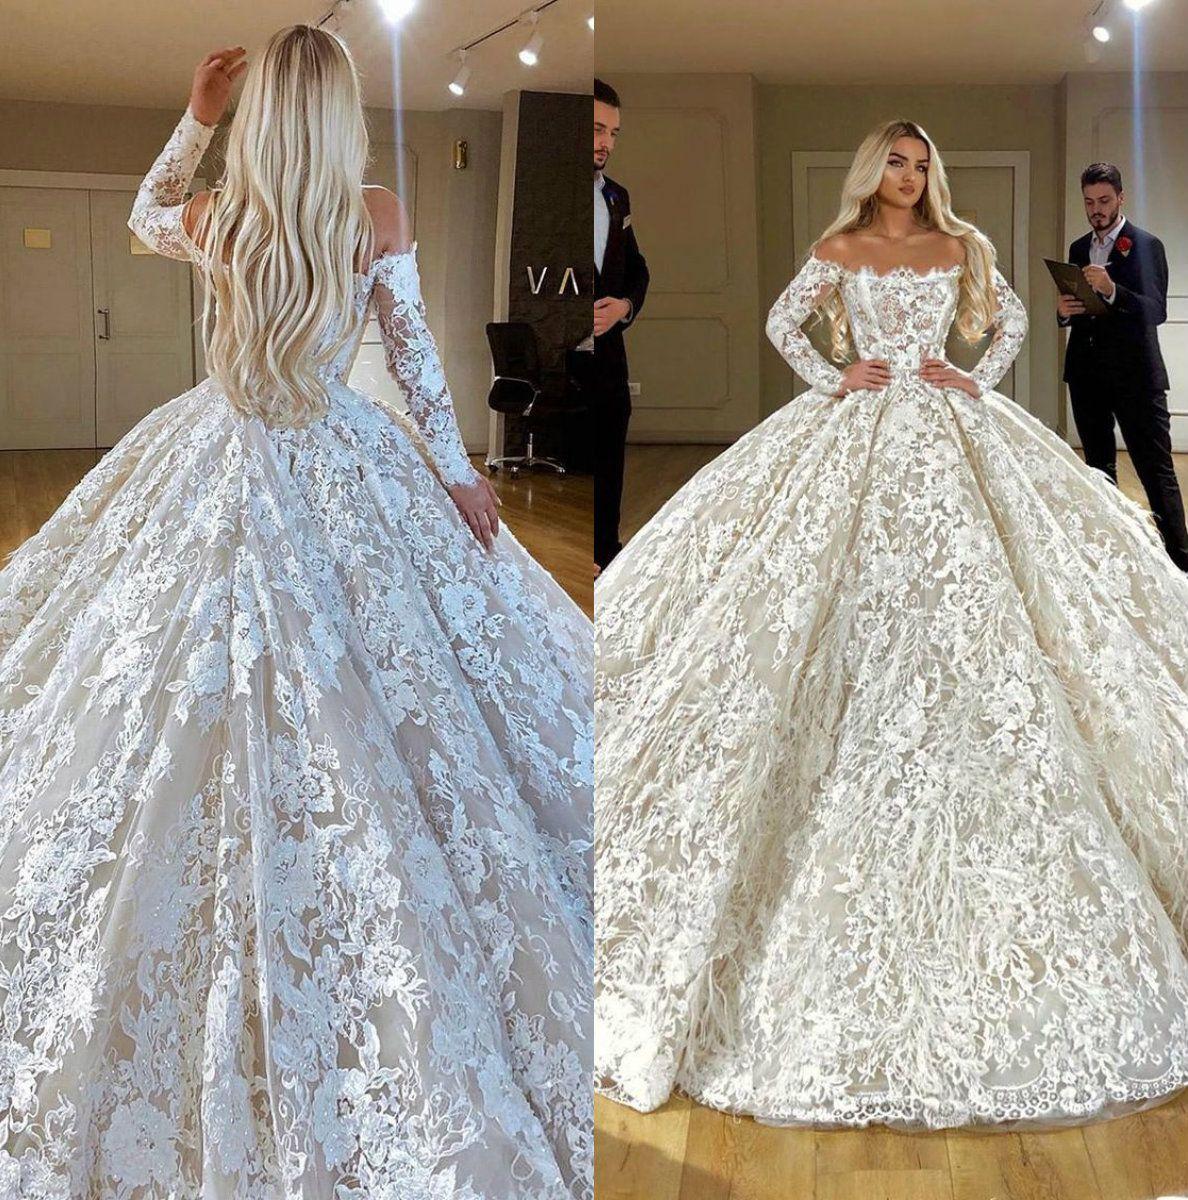 089dd54383d1 Acquista Abiti Da Sposa Di Lusso Ball Gown Abito Da Sposa Con Piume Abiti  Da Sposa Manica Lunga Backless Plus Size Dubai Arab Wedding Dress Custom A   522.27 ...